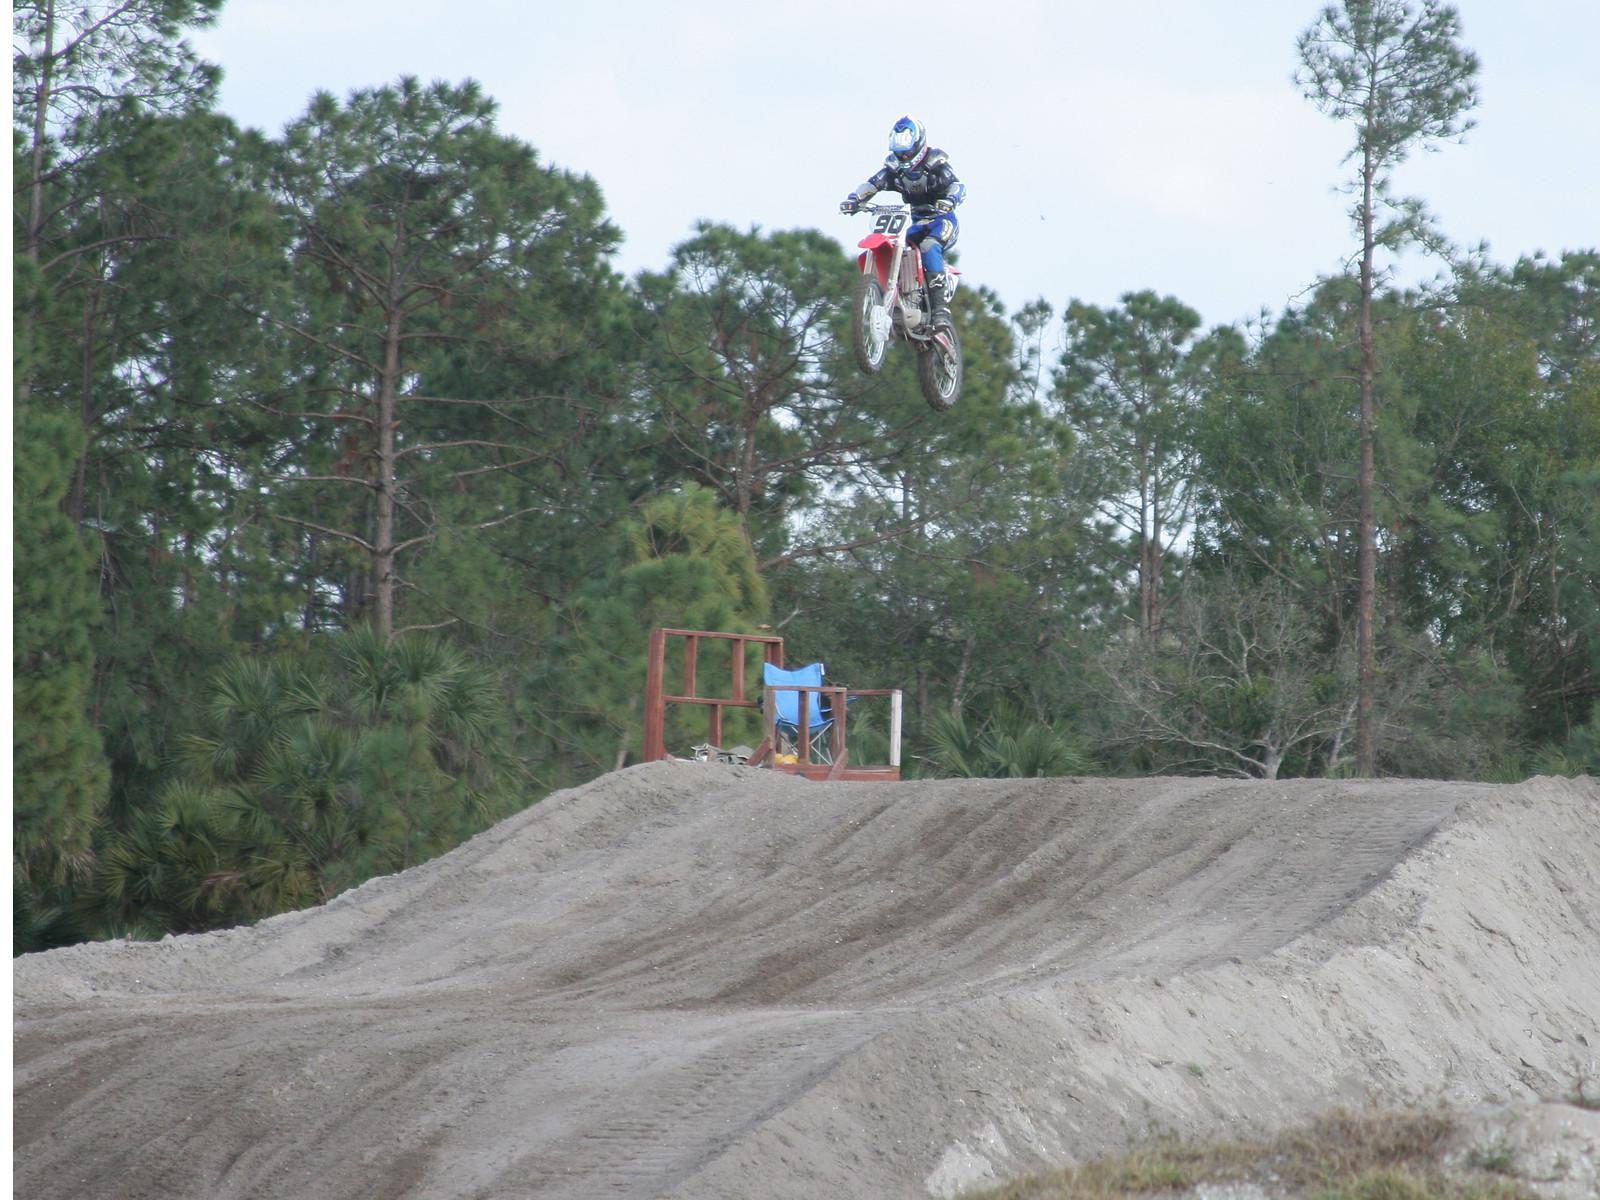 BIG AIR Seminole MX Fla - JOHN CHOATE - Motocross Pictures - Vital MX